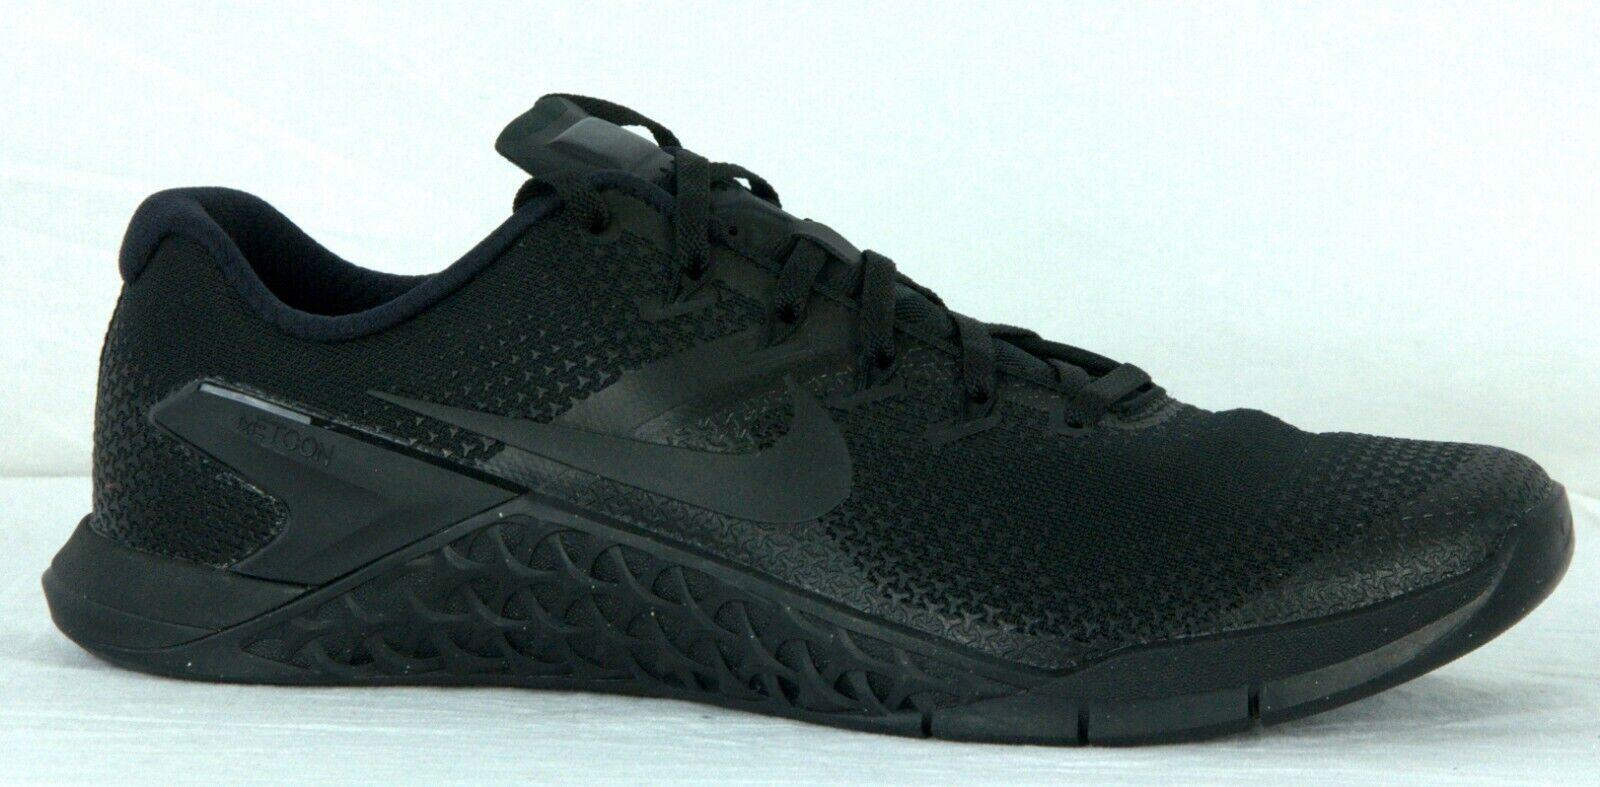 Nike Mens Metcon 4 Gym Cross Training scarpe AH7453 001 nero Hpr Crimson Sz 12